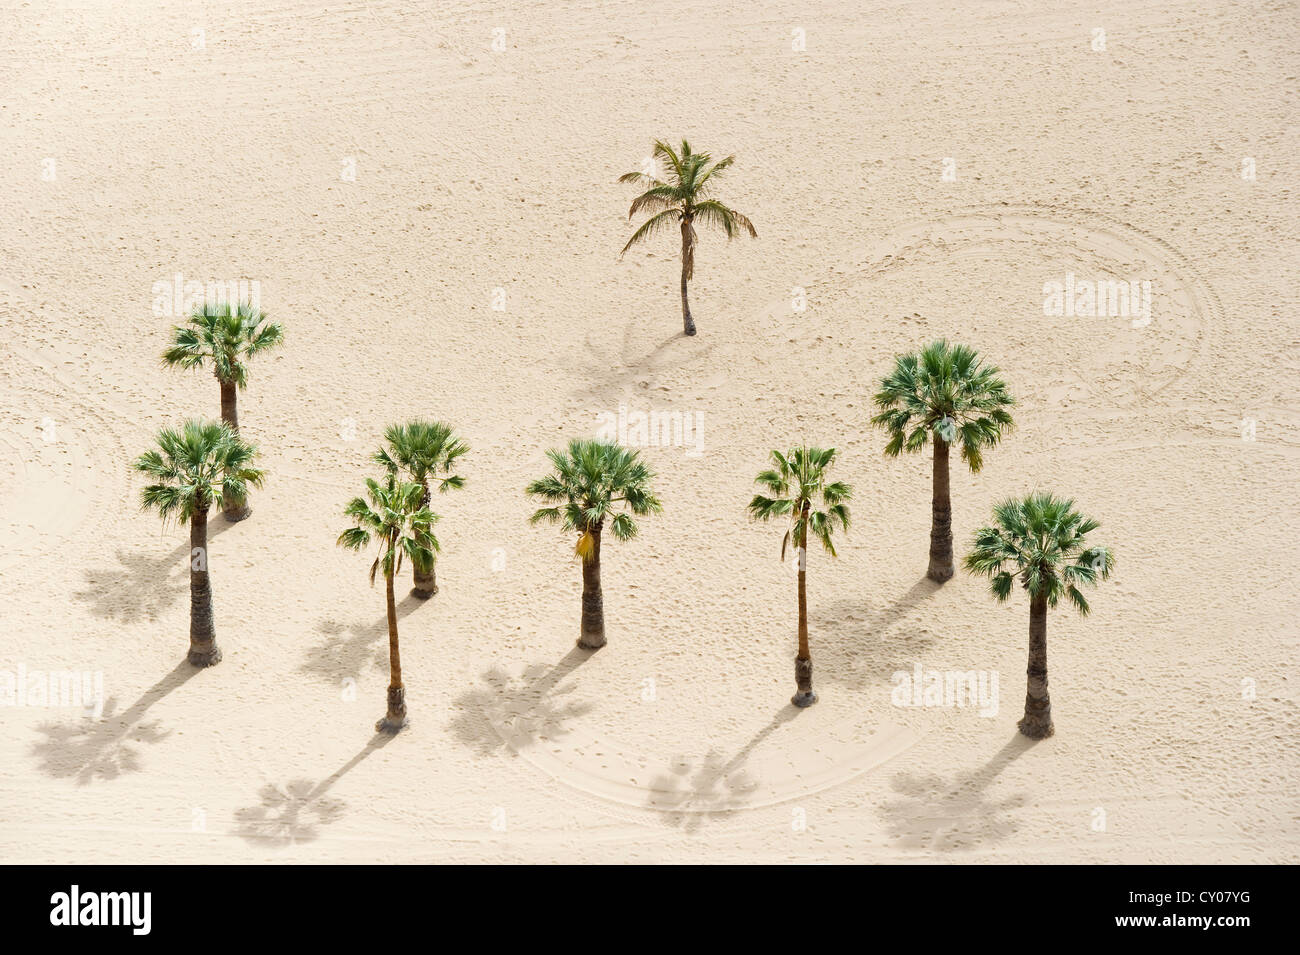 Bird's eye view, palm trees and beach, Playa de las Teresitas, San Andres, Tenerife, Canary Islands, Spain, - Stock Image